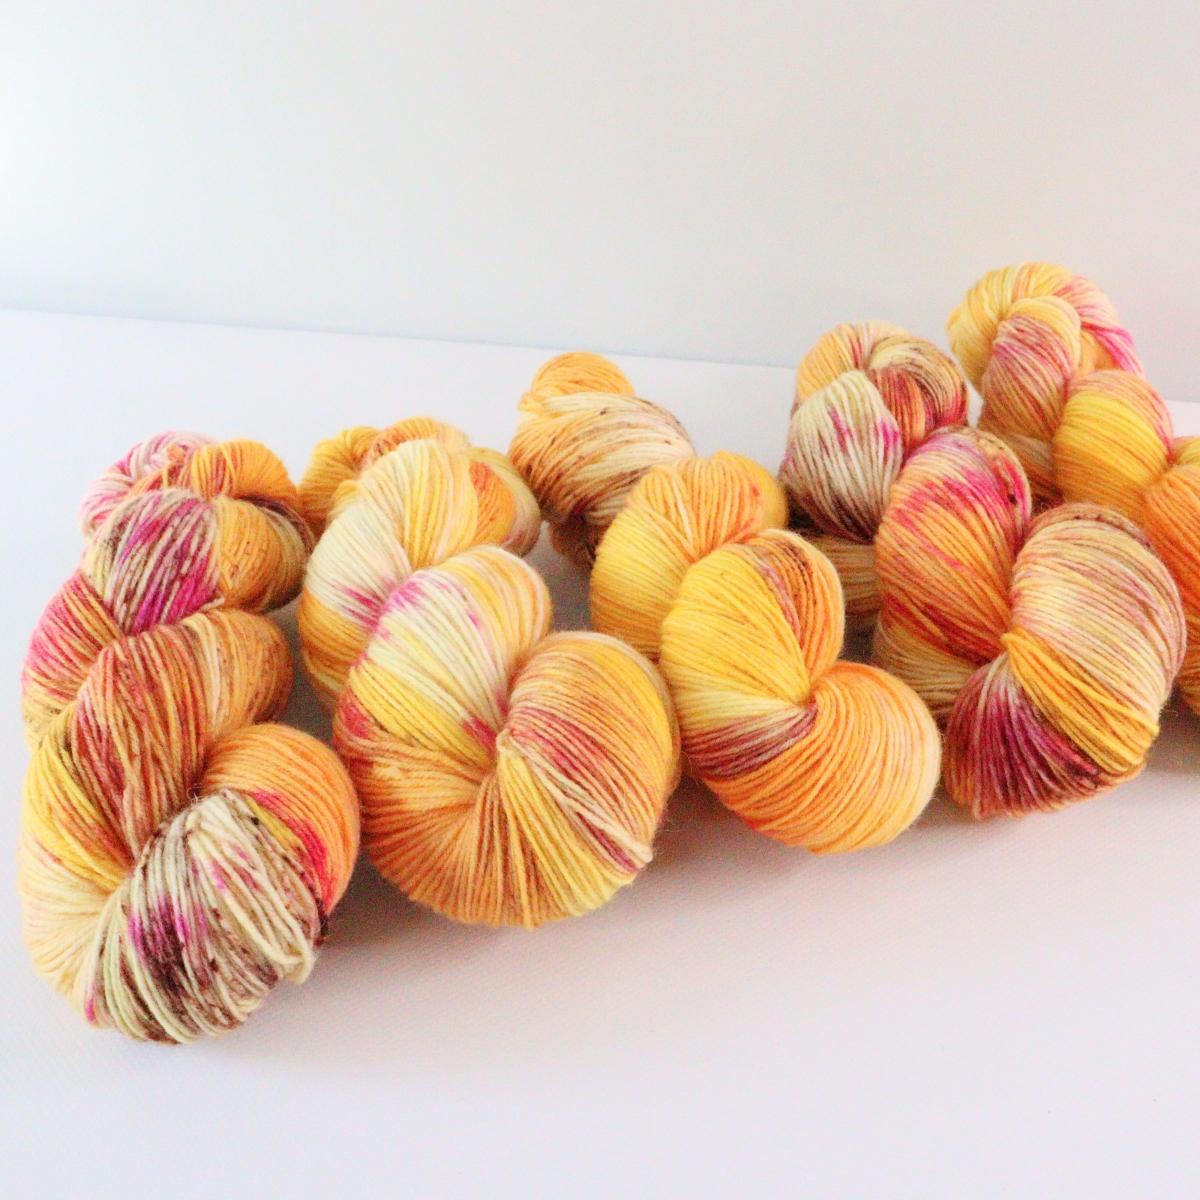 woodico.pro hand dyed yarn 071 1200x1200 - Hand dyed yarn / 071